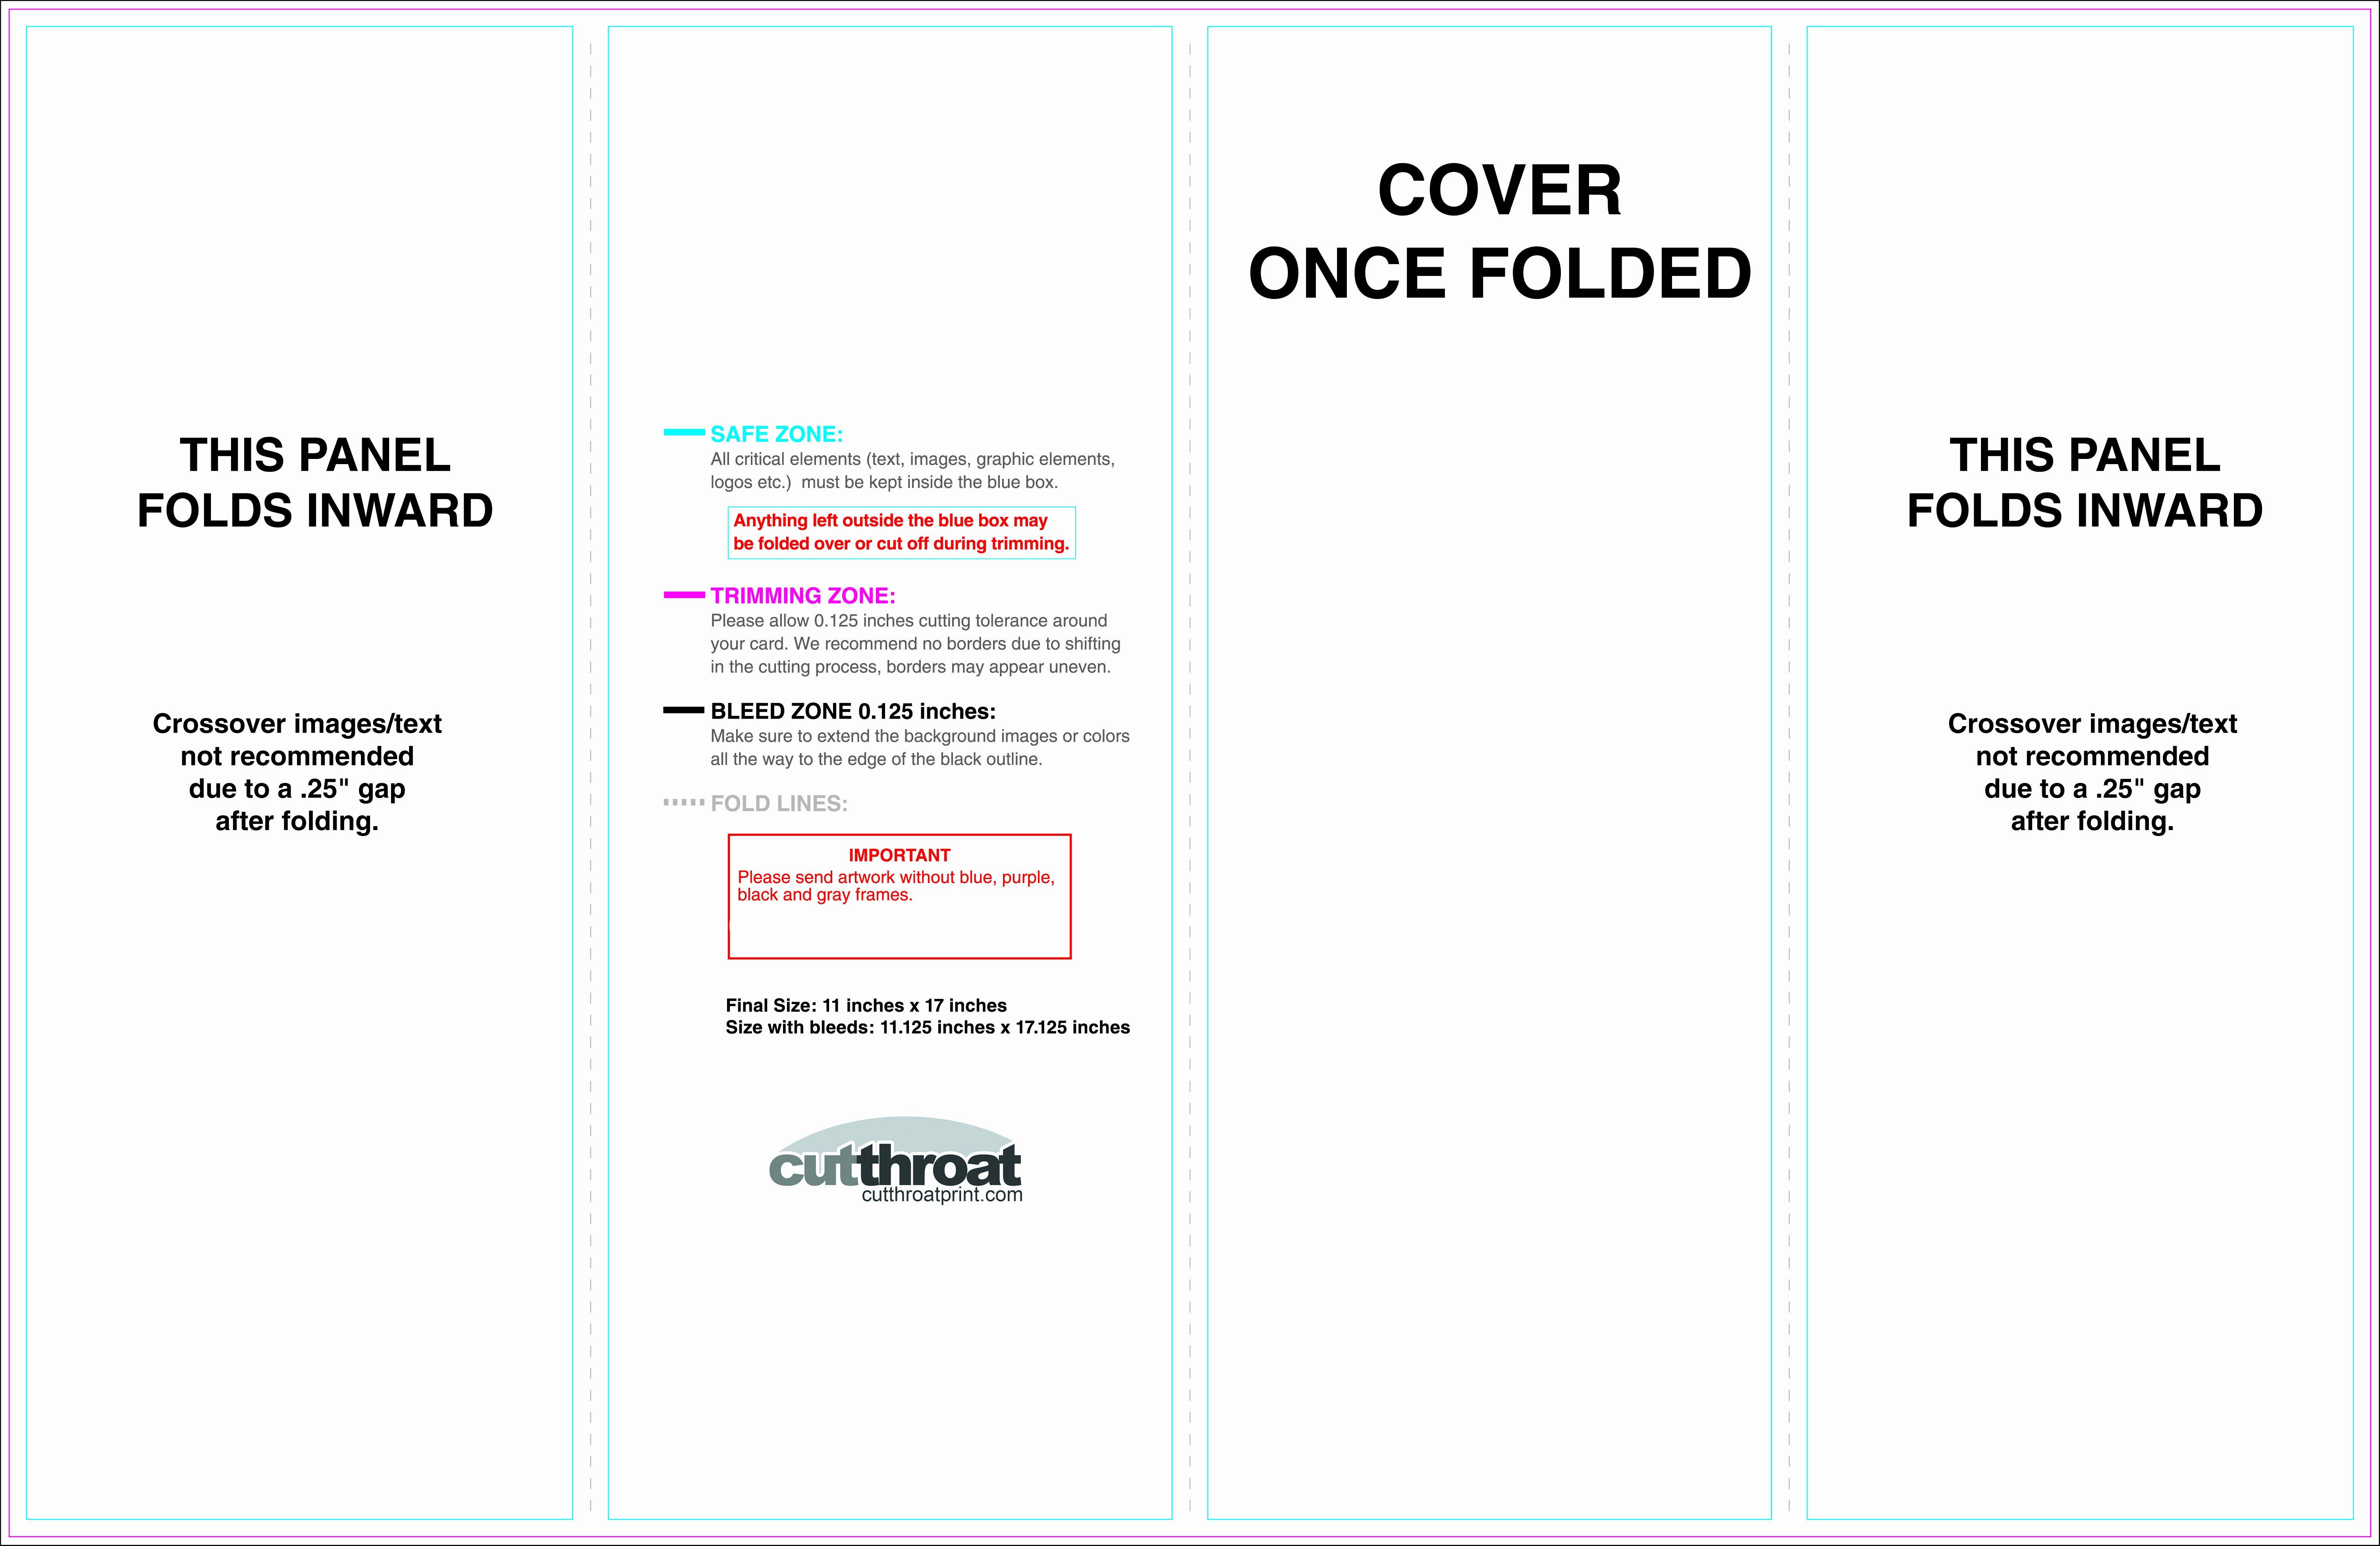 11x17 Tri Fold Brochure Template Fresh Cutthroat Printcustom Brochure Printing